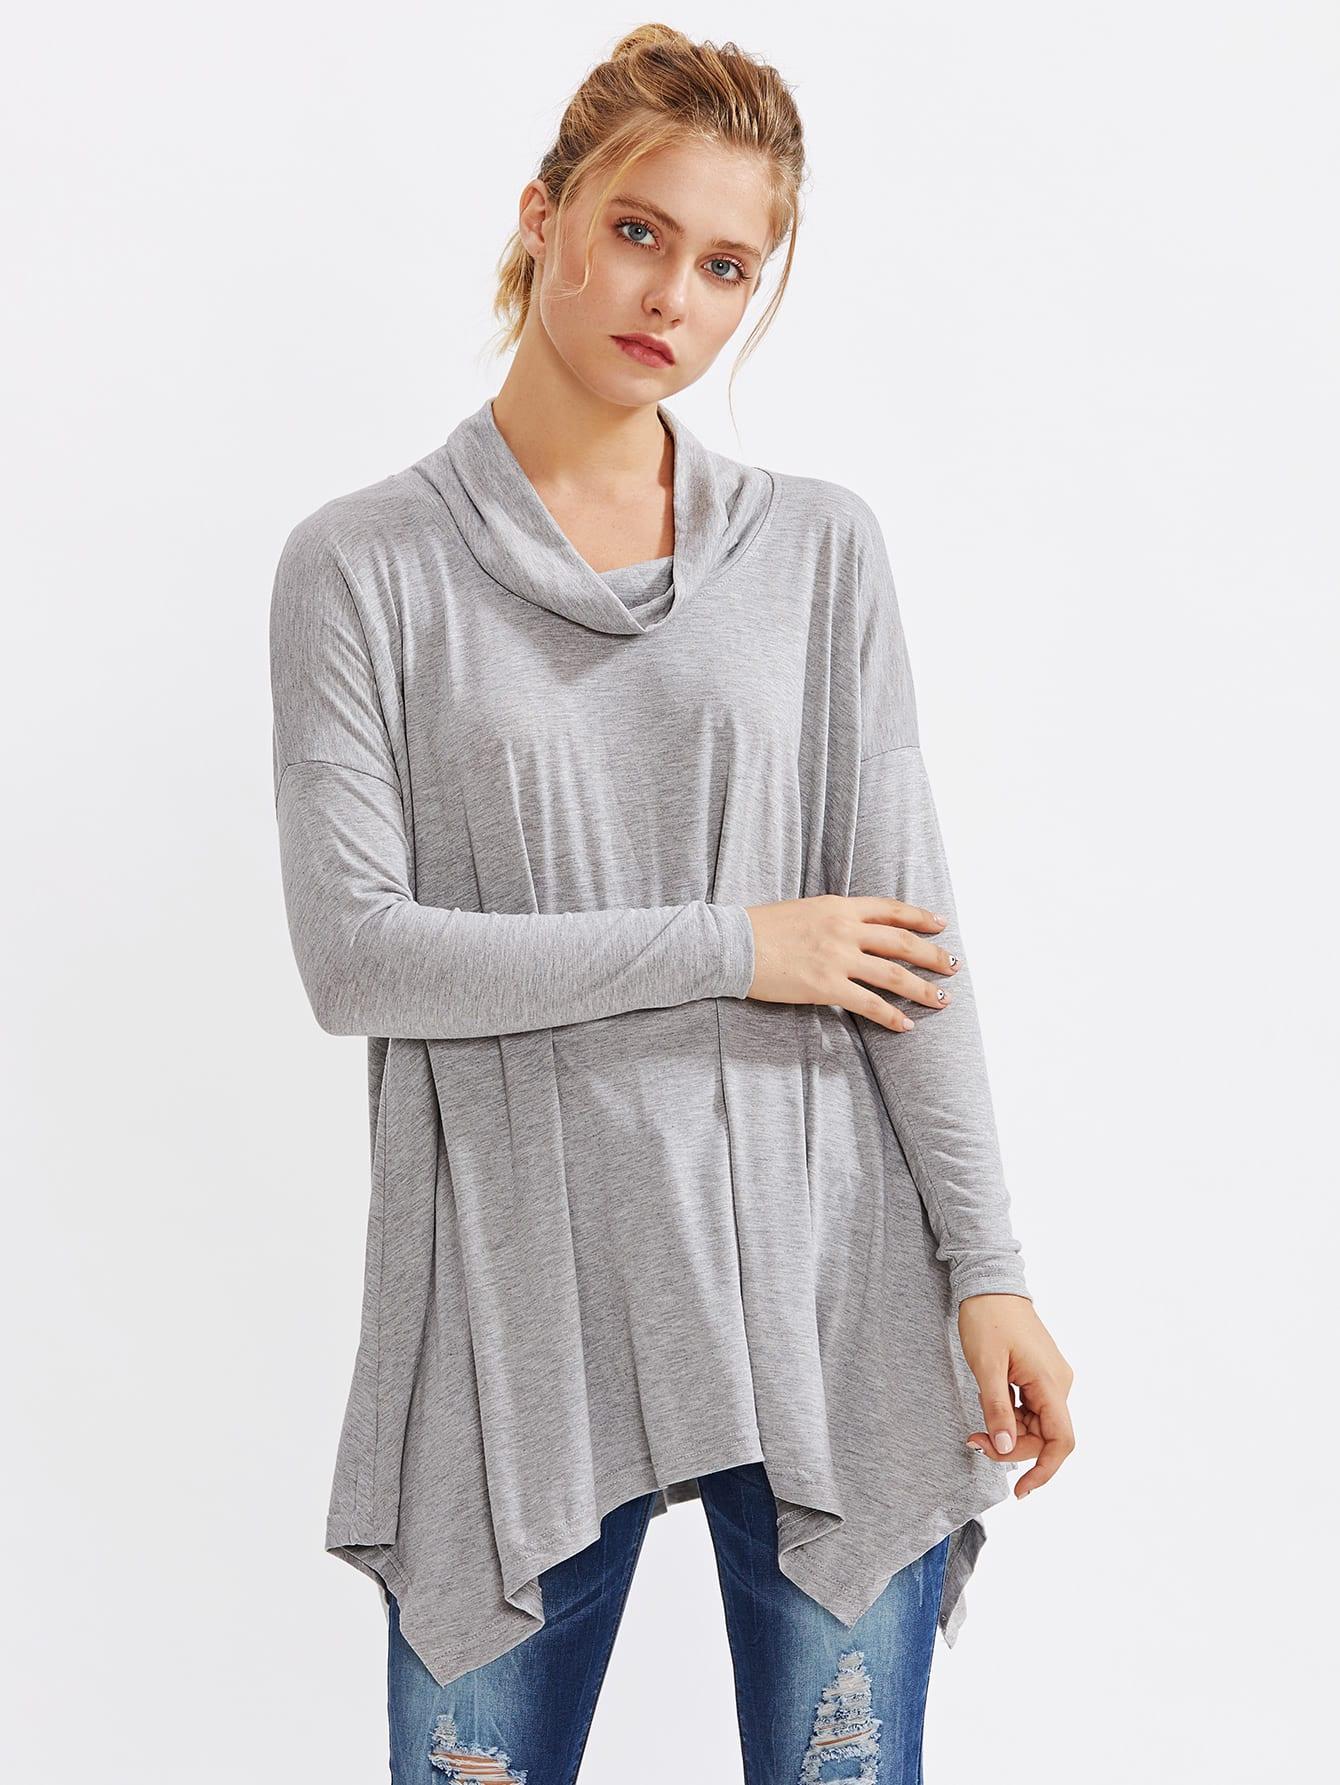 Cowl Neck Drop Shoulder Hanky Hem Marled Tee drop shoulder letter print marled crop sweatshirt